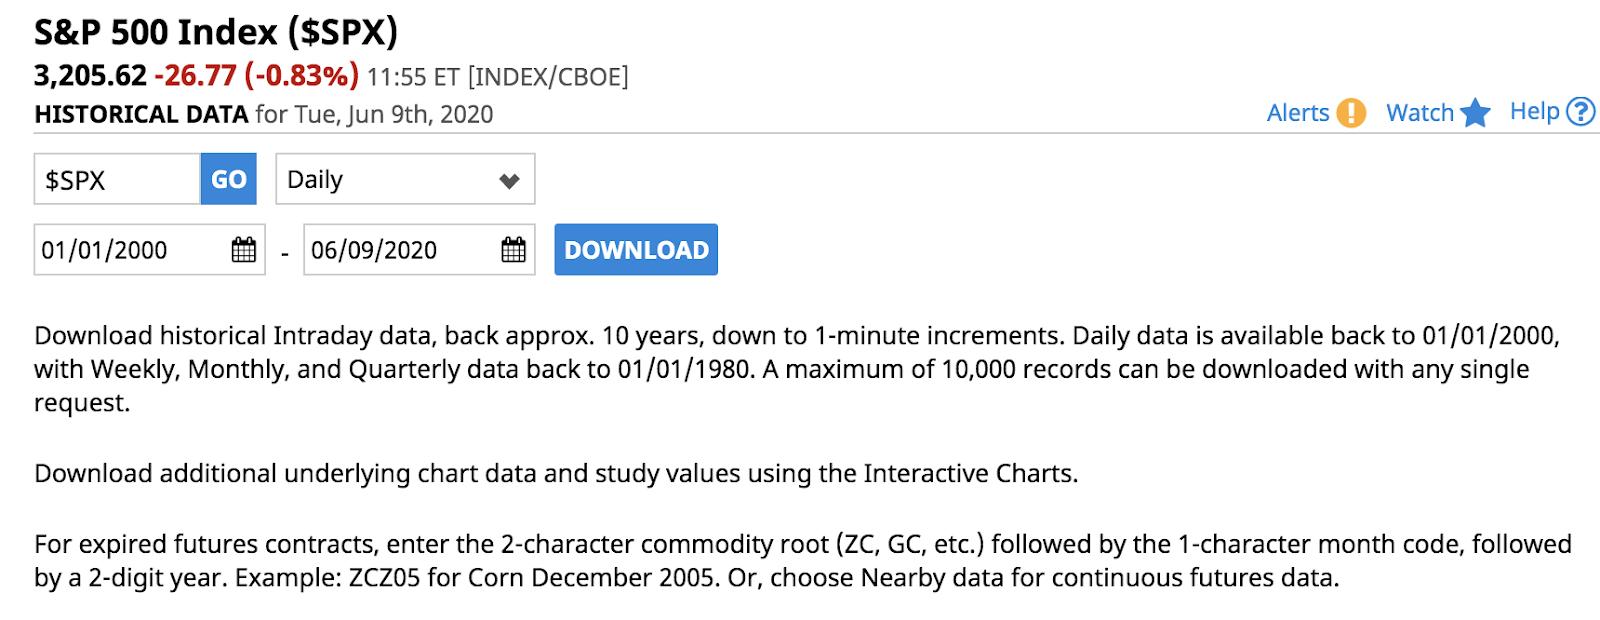 Historical S&P Data